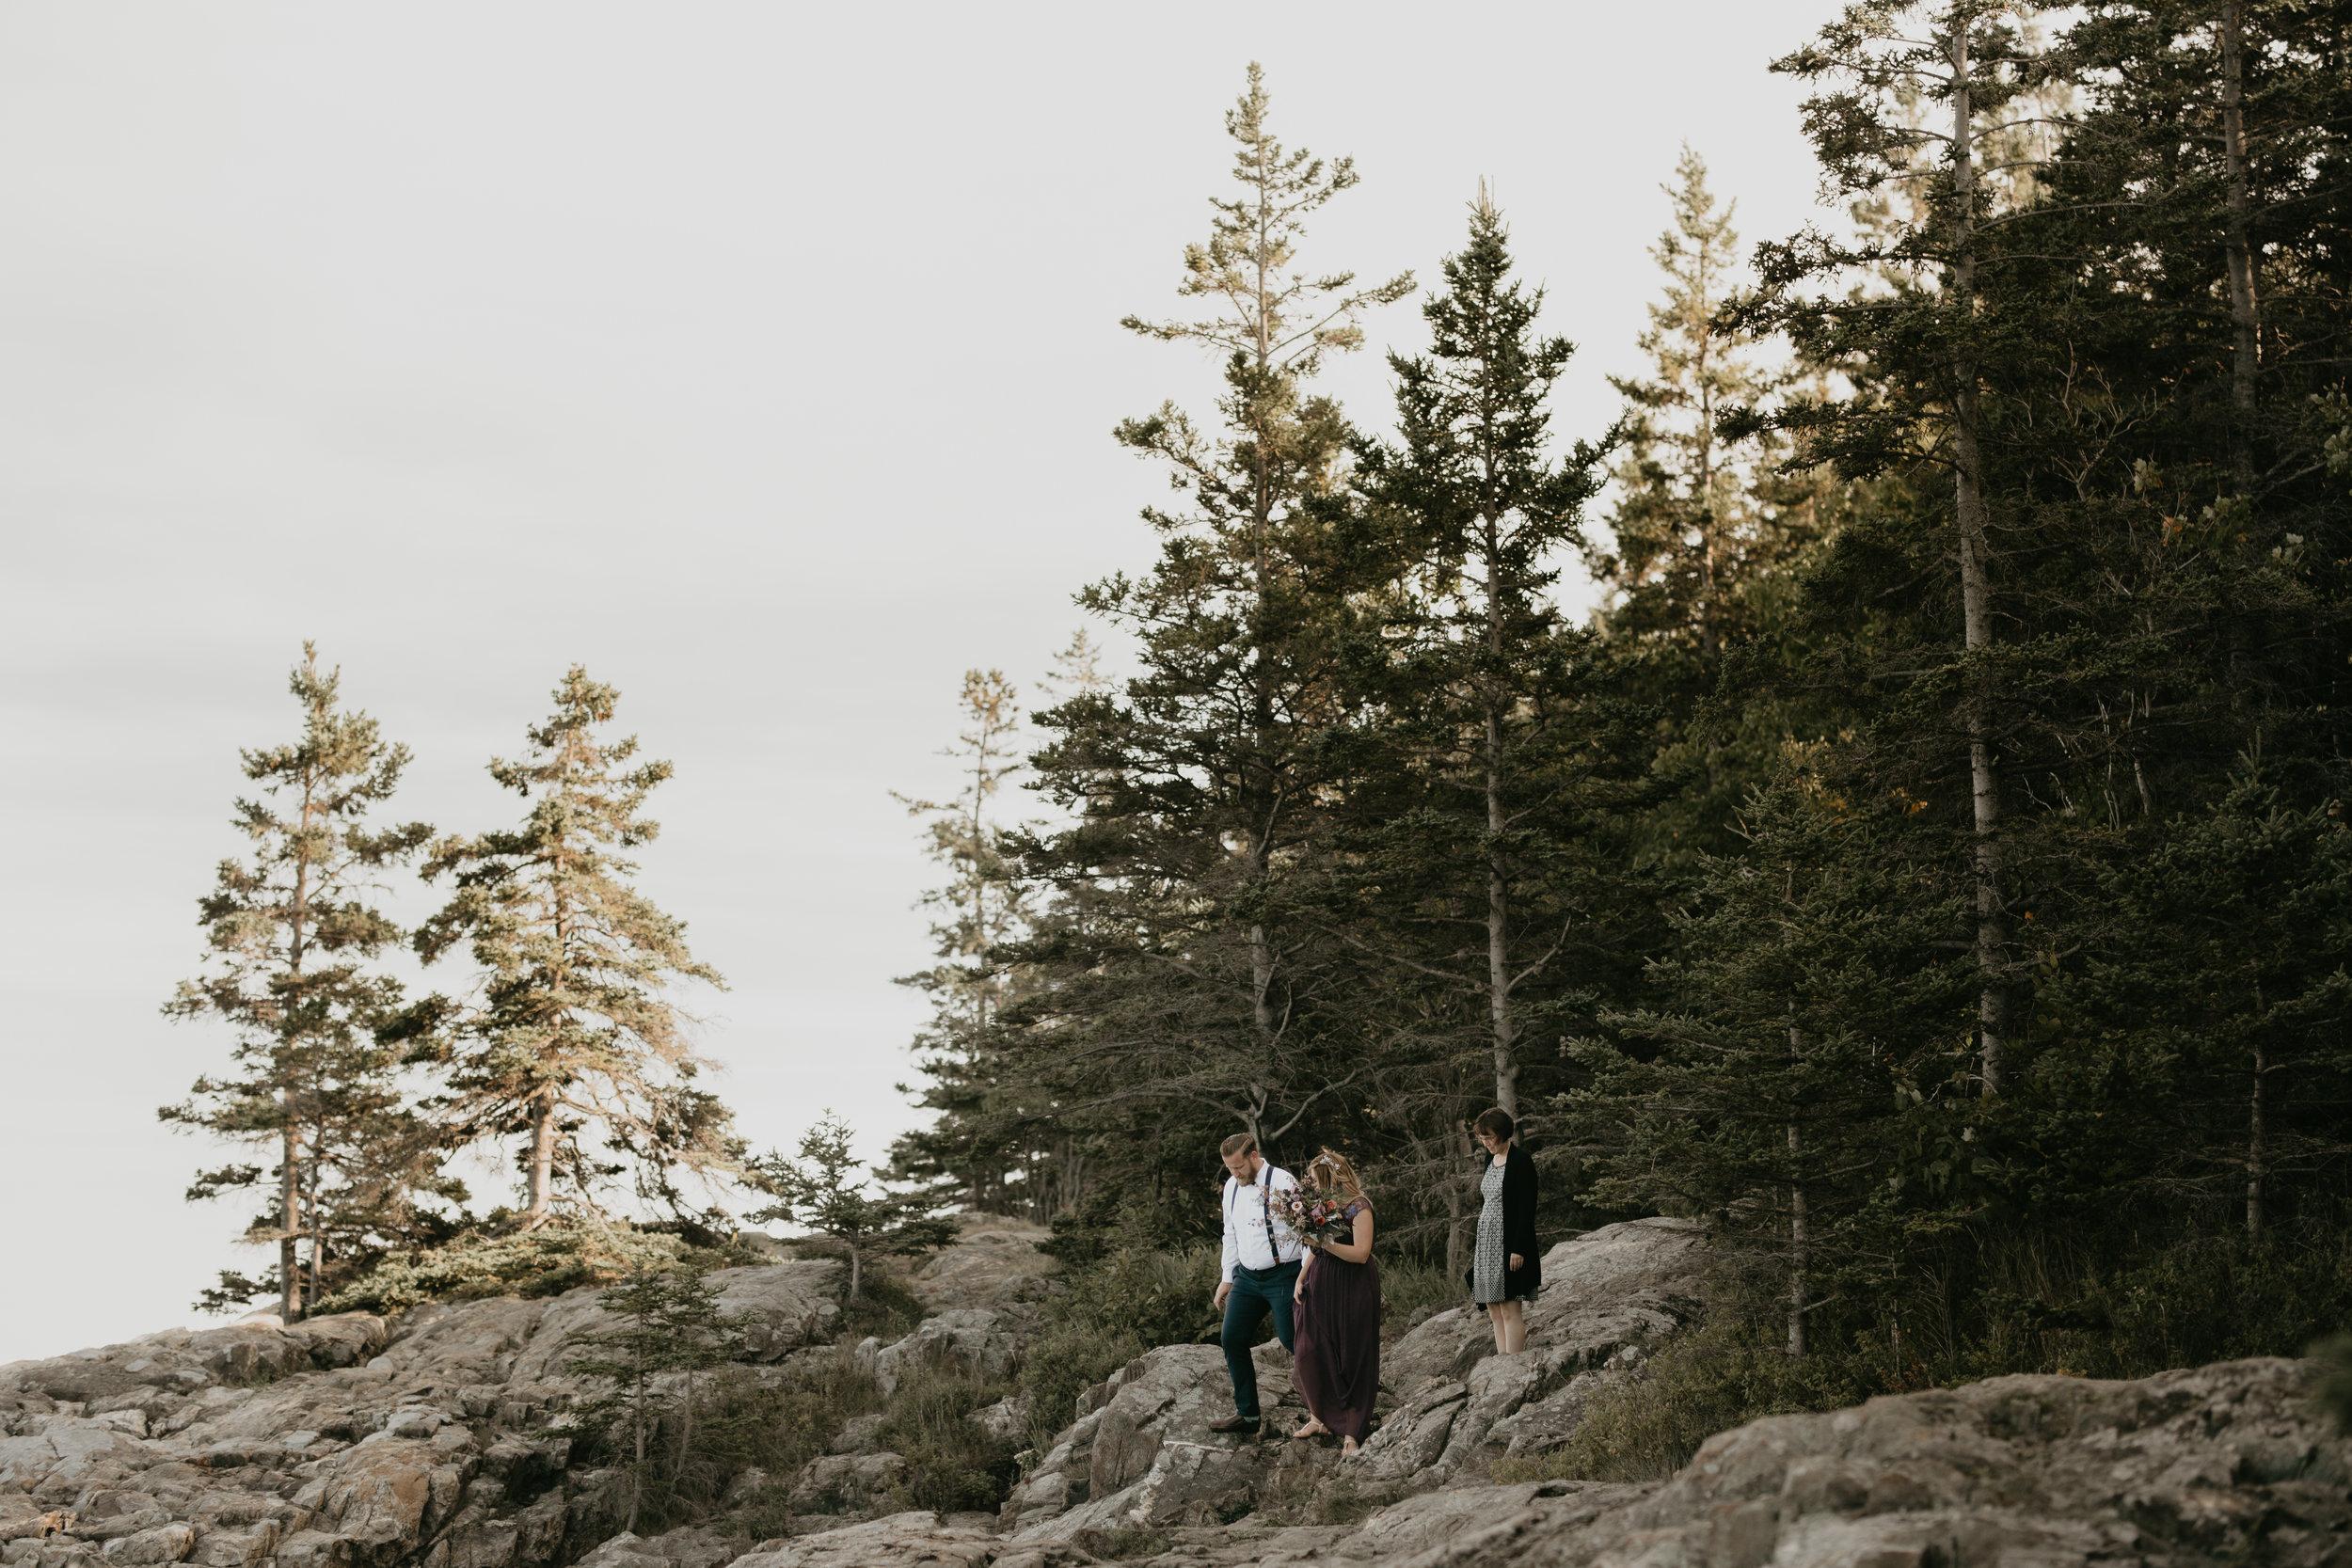 nicole-daacke-photography-Elopement-rocky-shoreline-coast-Acadia-National-Park-elopement-photographer-inspiration-maine-elopement-otter-cliffs-schoonic-head-point-13.jpg